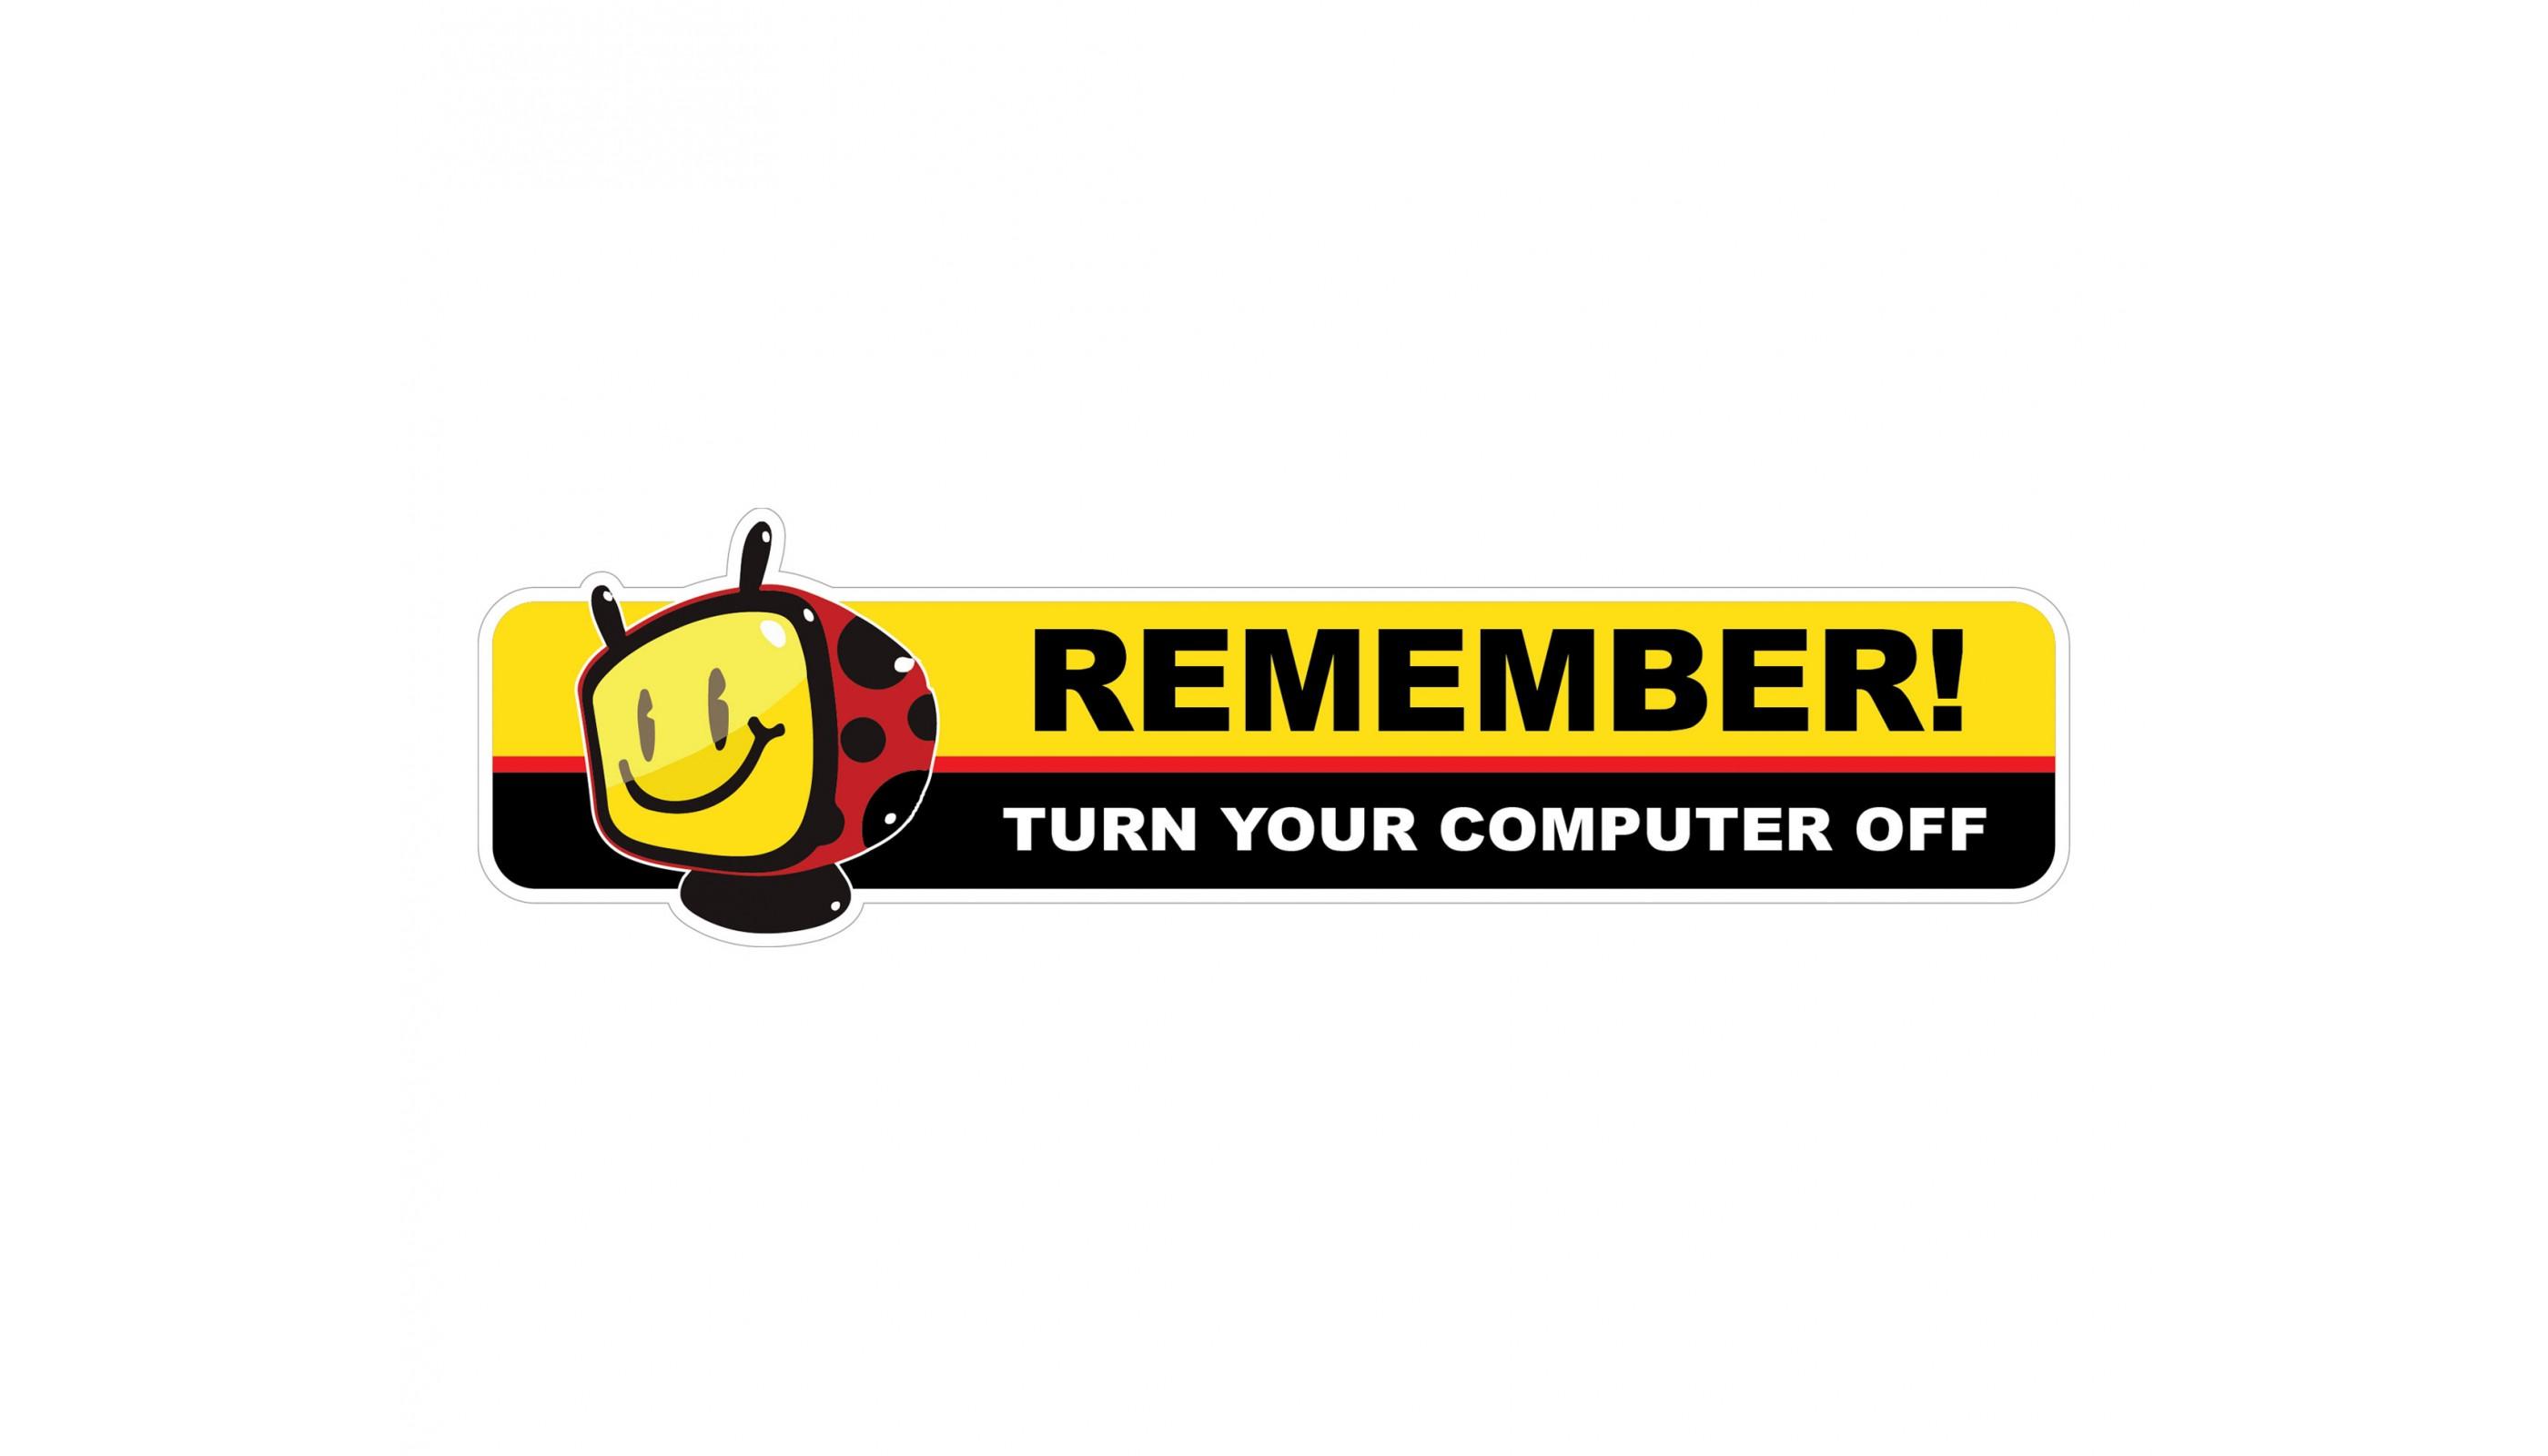 Turn Your Computer Off - Warning Vinyl Sticker